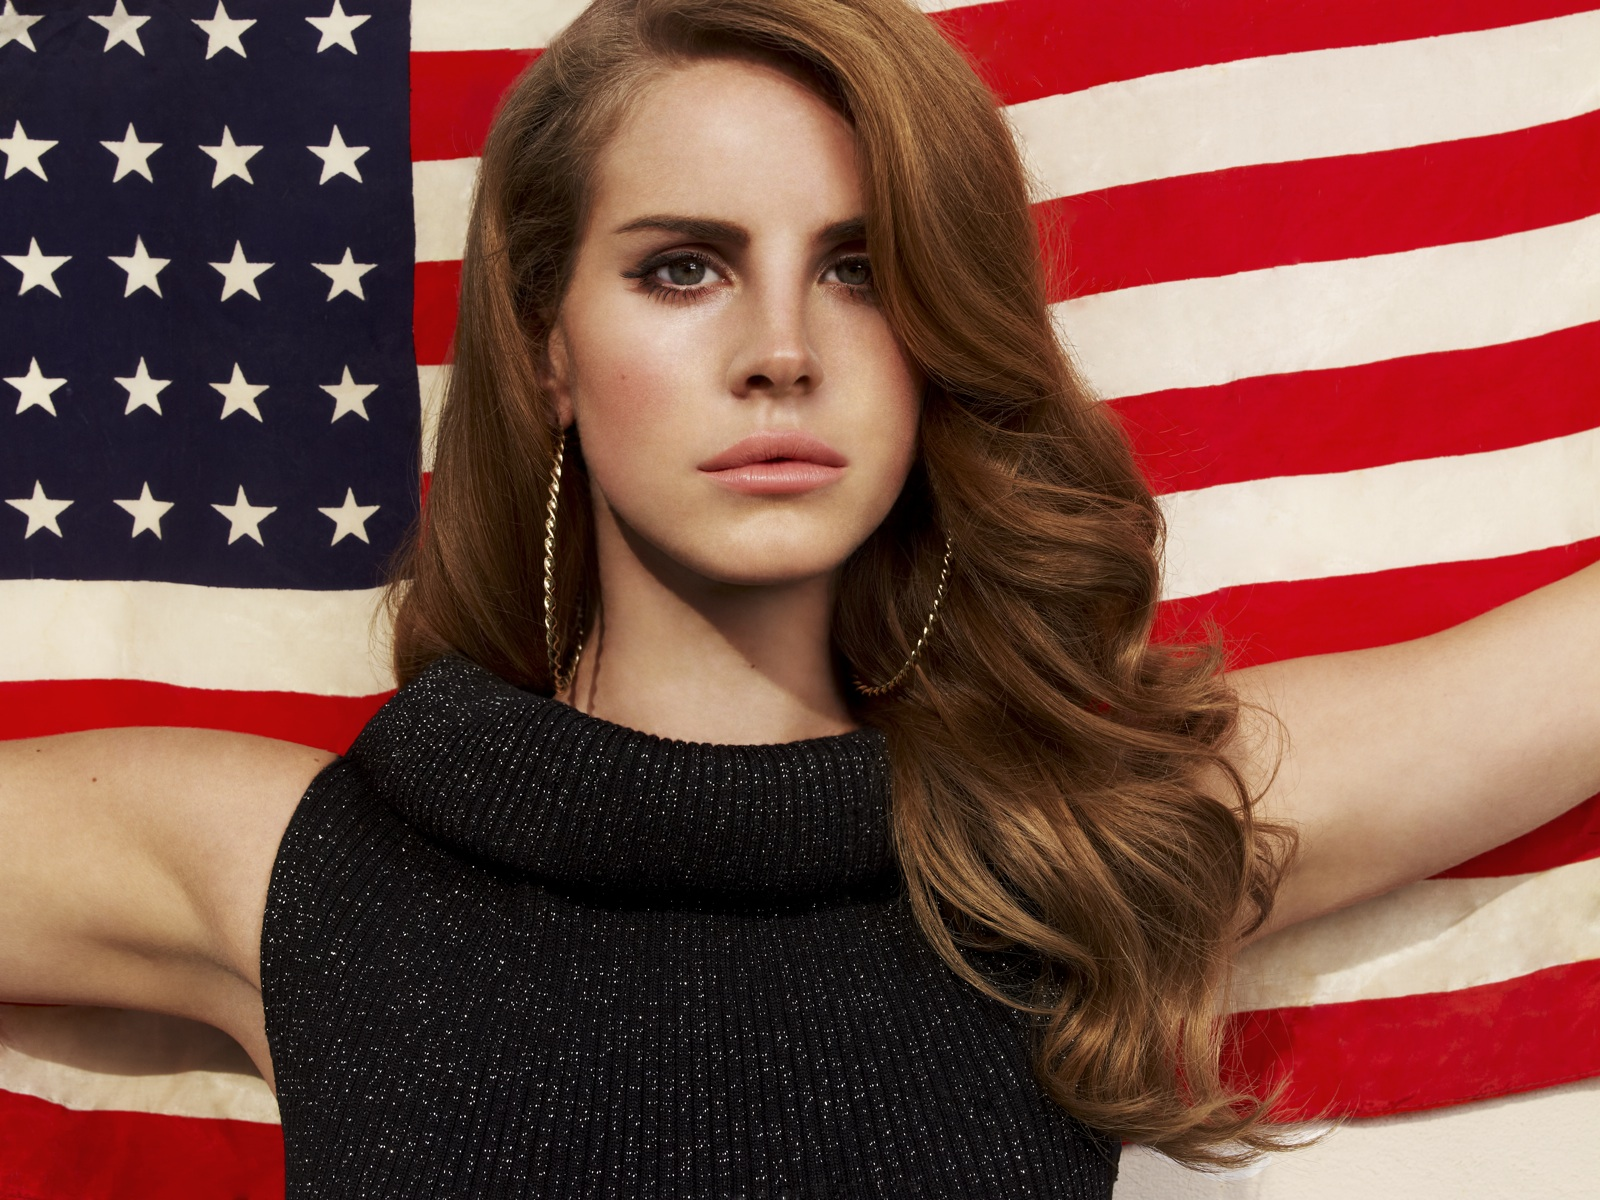 Raspberry Beret Girl Born To Die Lana Del Rey Album Review